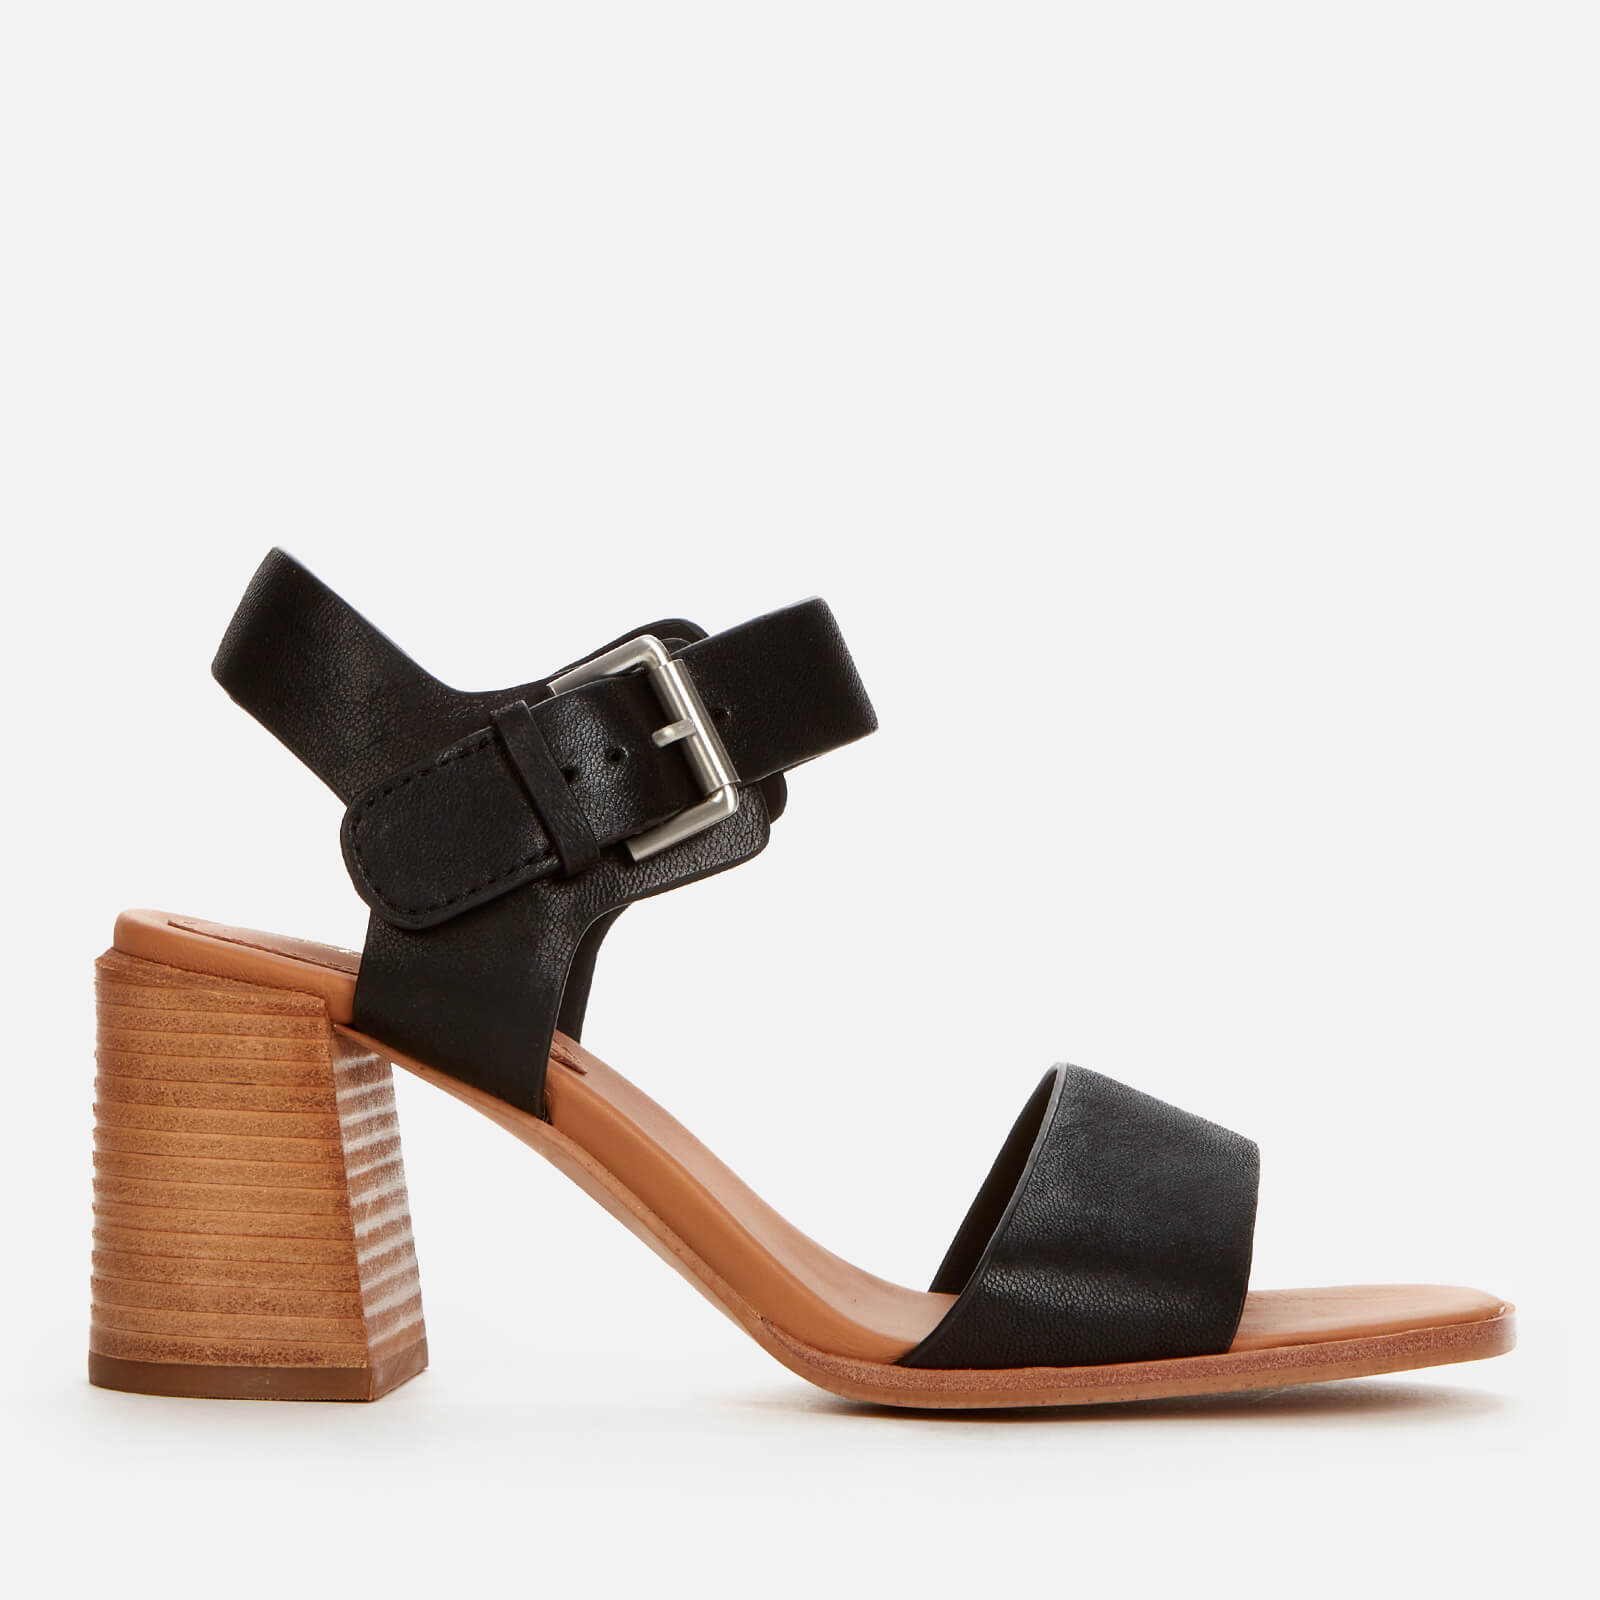 Clarks Women's Landra70 Strap Leather Heeled Sandals - Black - Uk 3